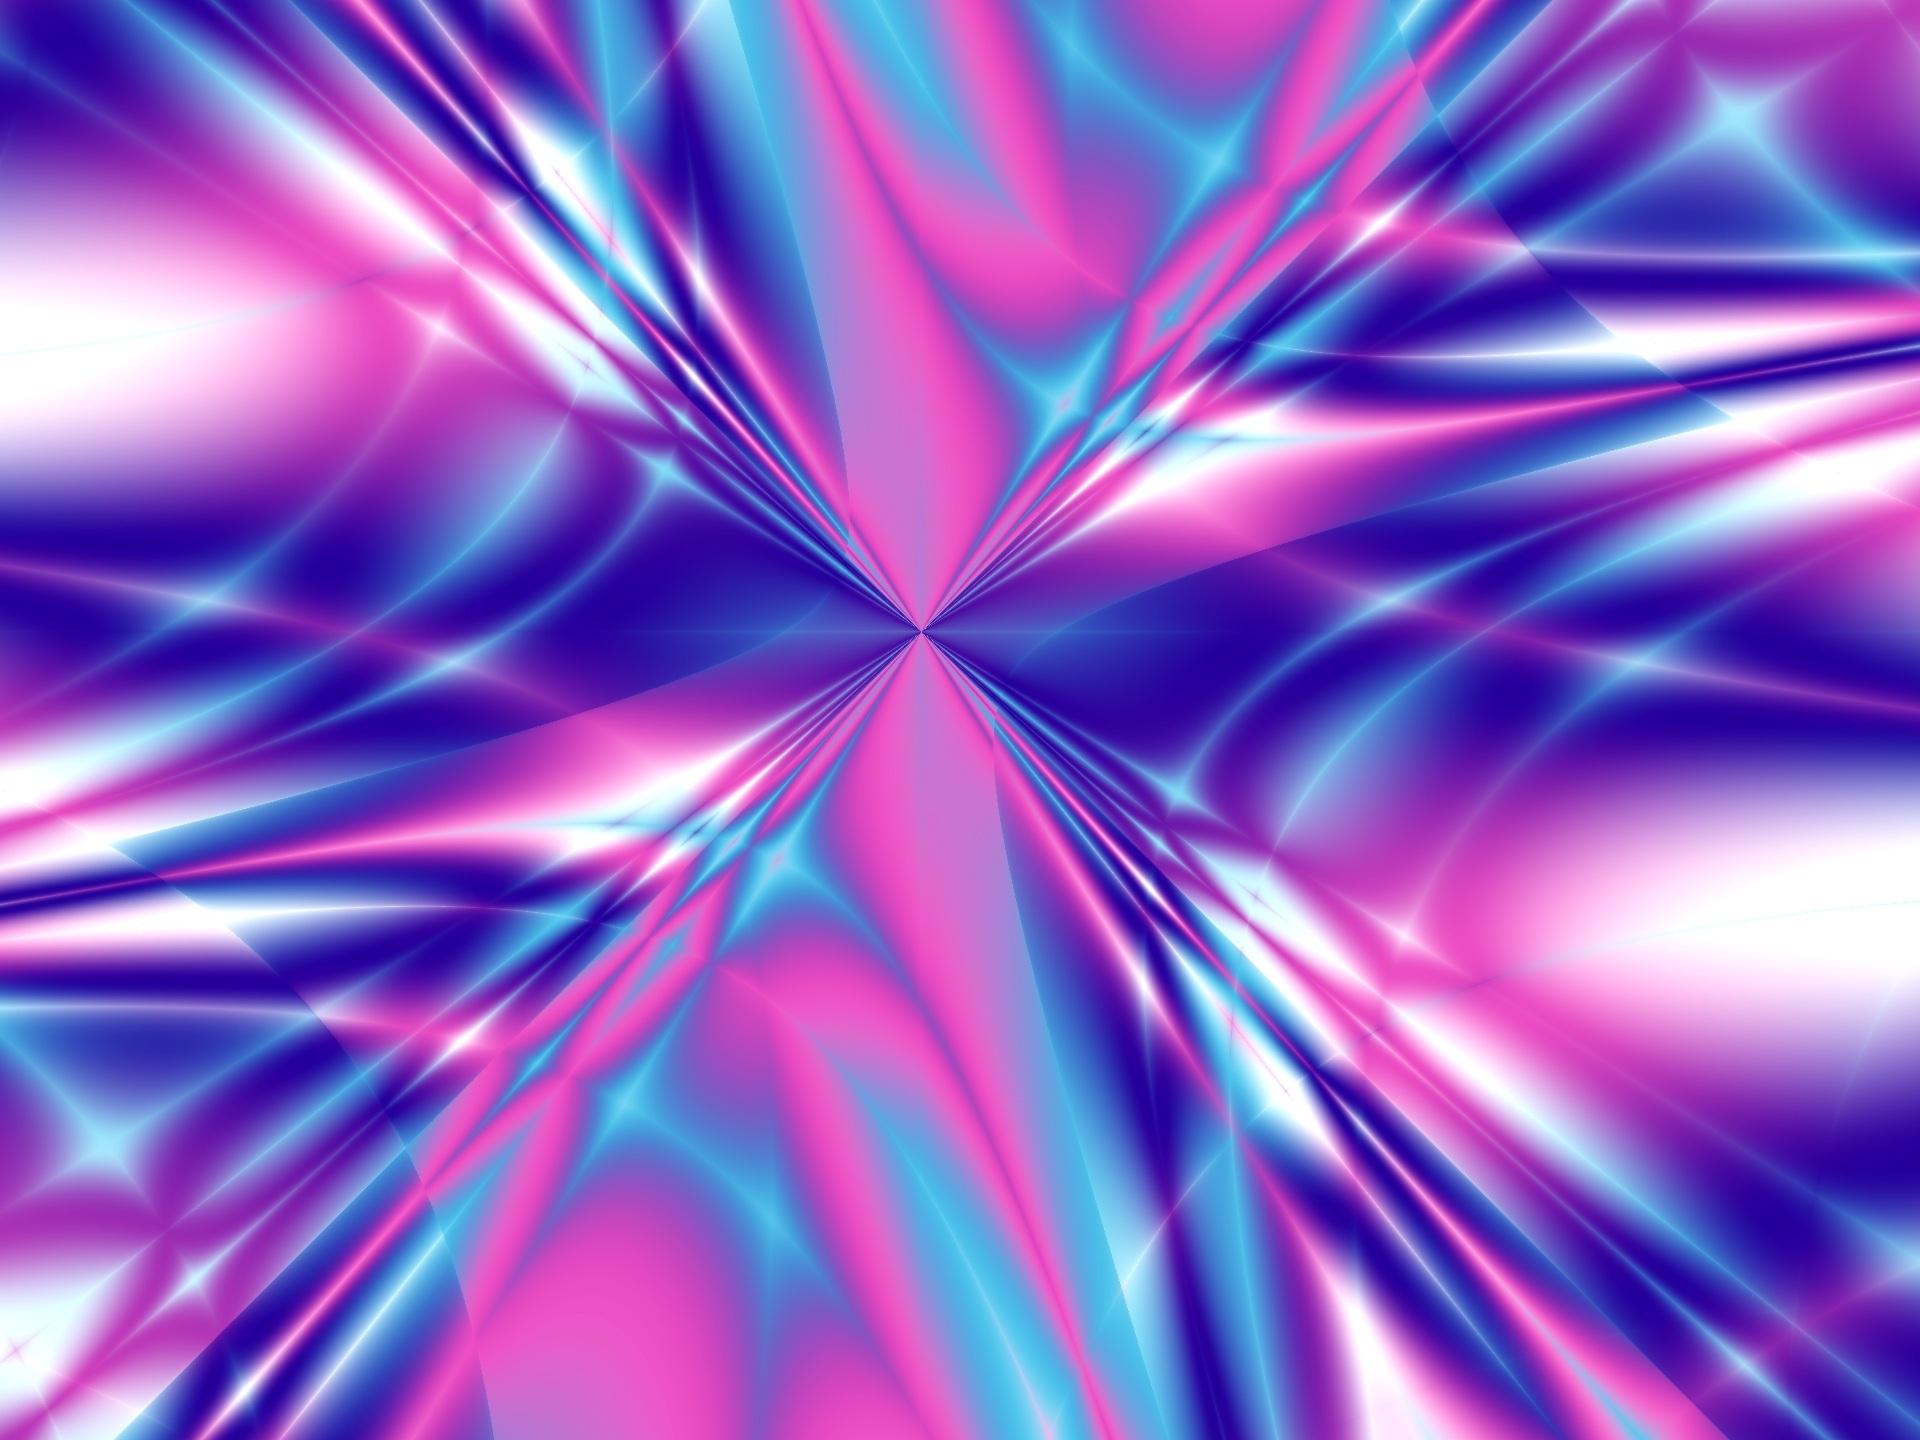 Wallpaper Sunlight Purple Blue Circle Lens Flare Pink